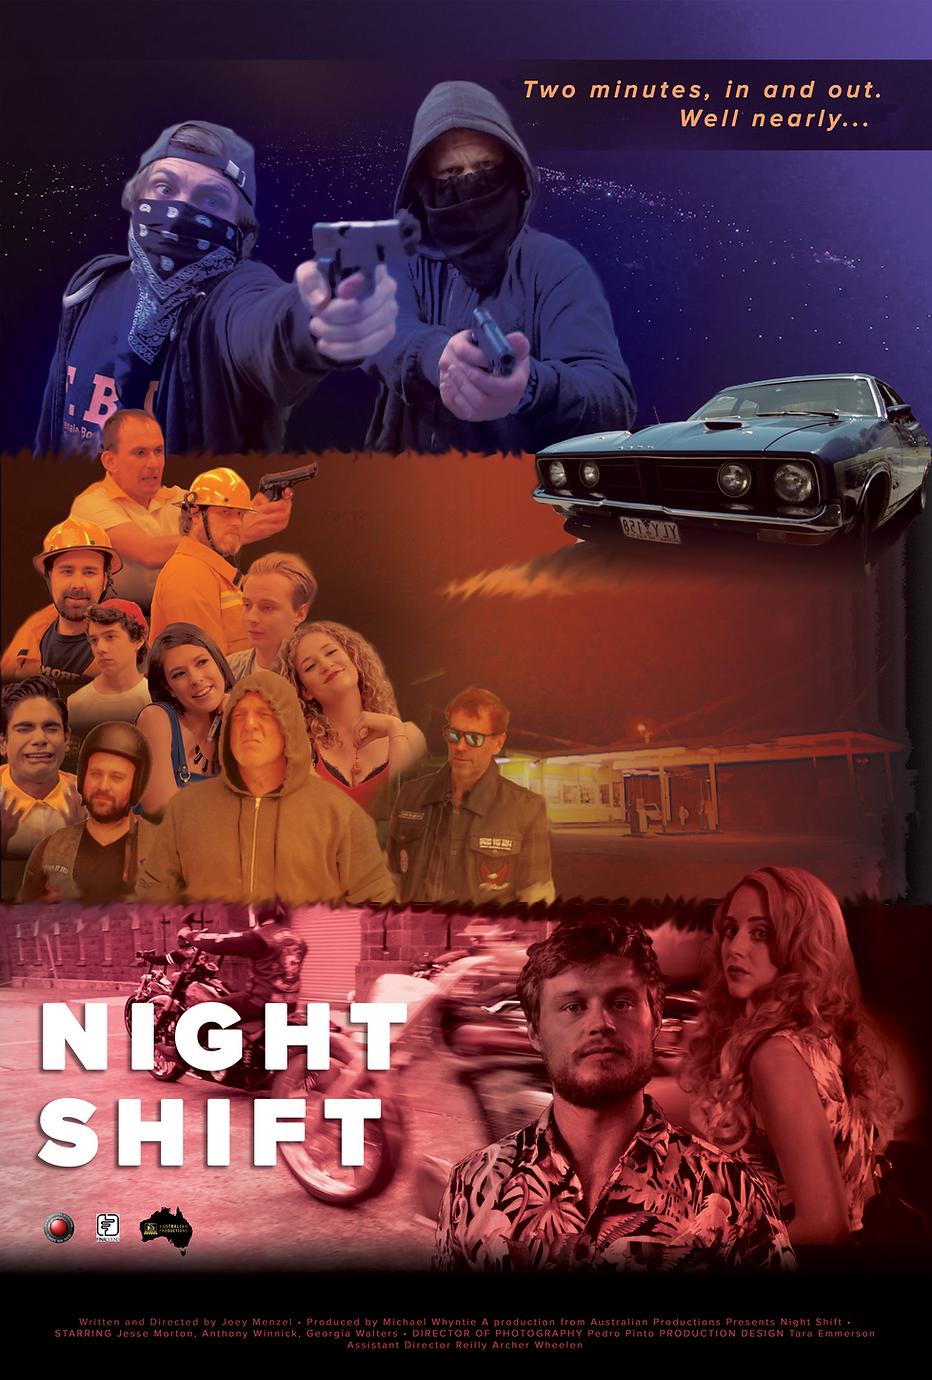 Rough Night-Shift-Promo-Poster-v10.png